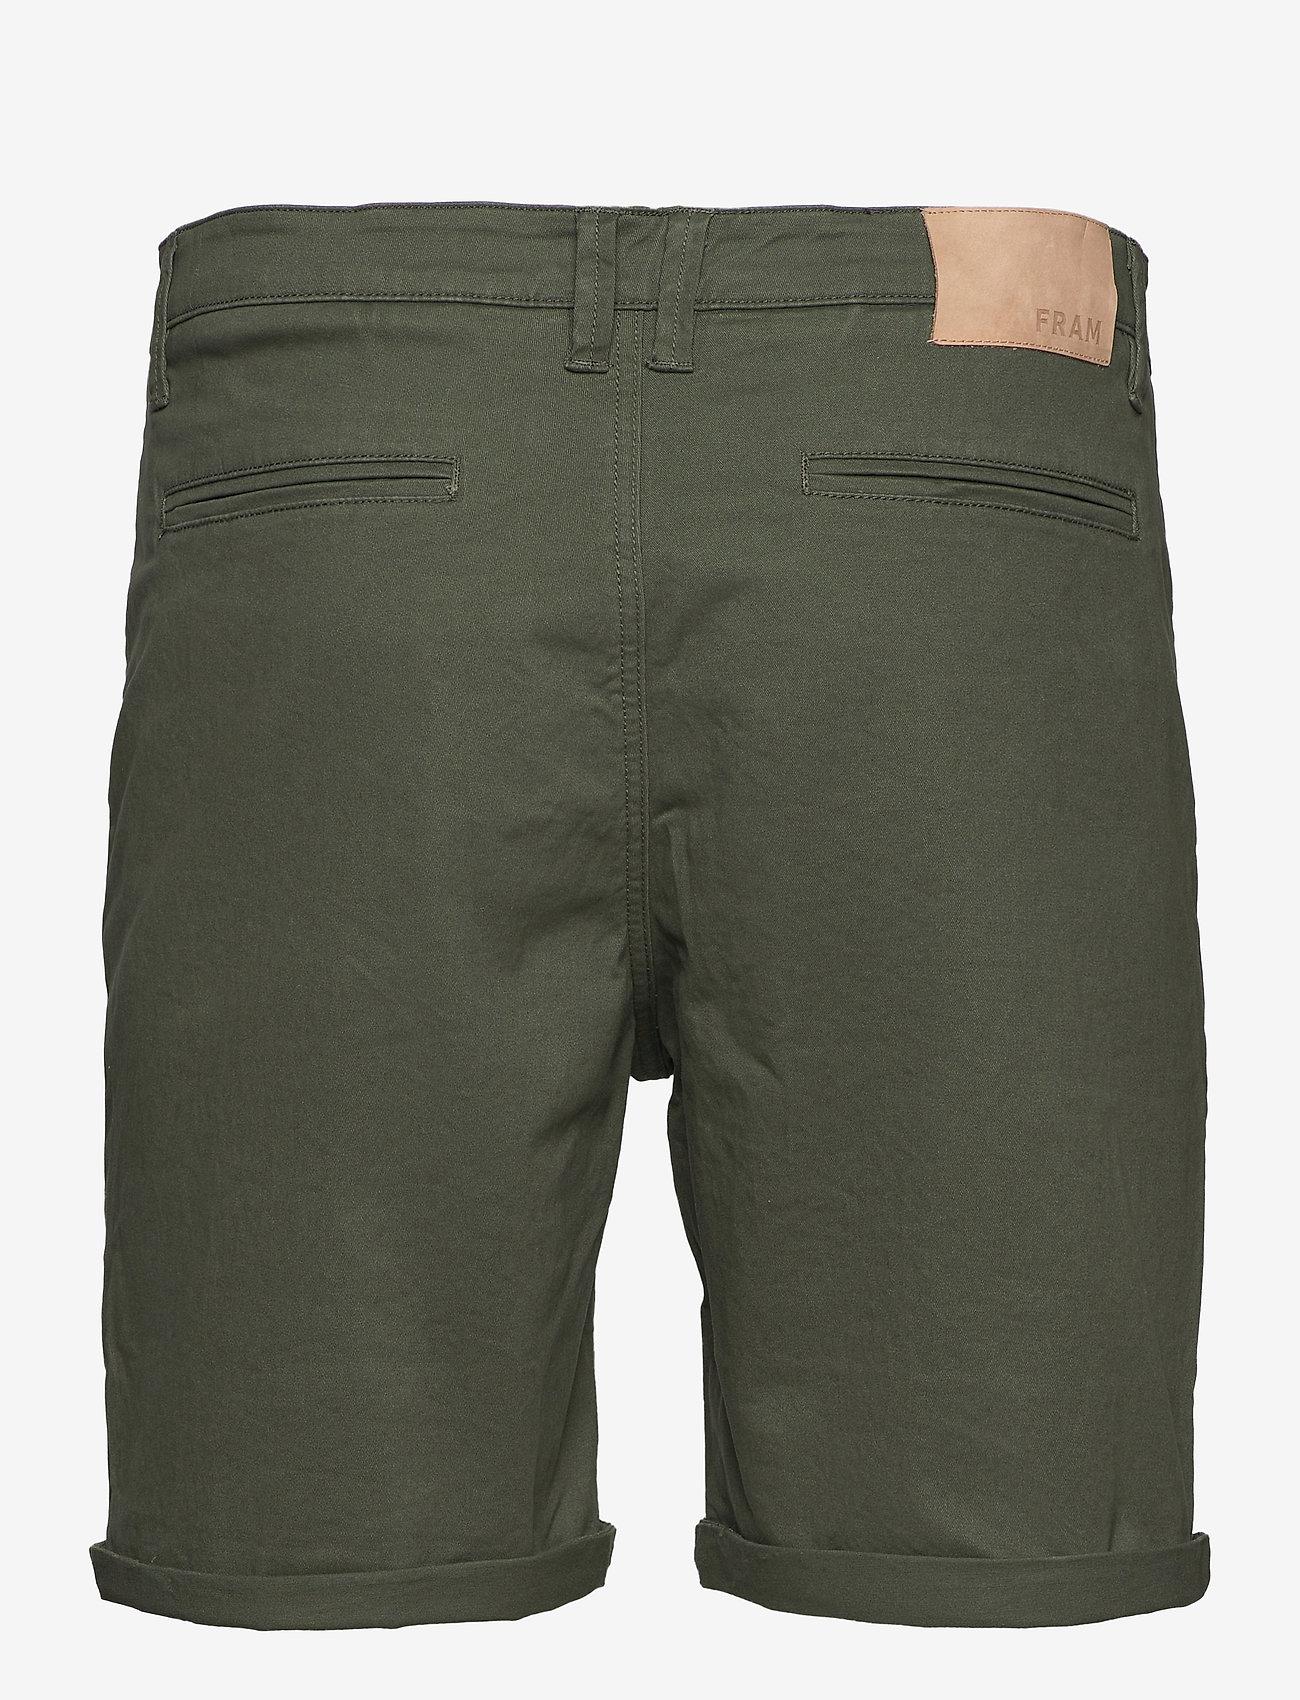 FRAM - Bygdøy Shorts - chinos shorts - deep lichen green - 1